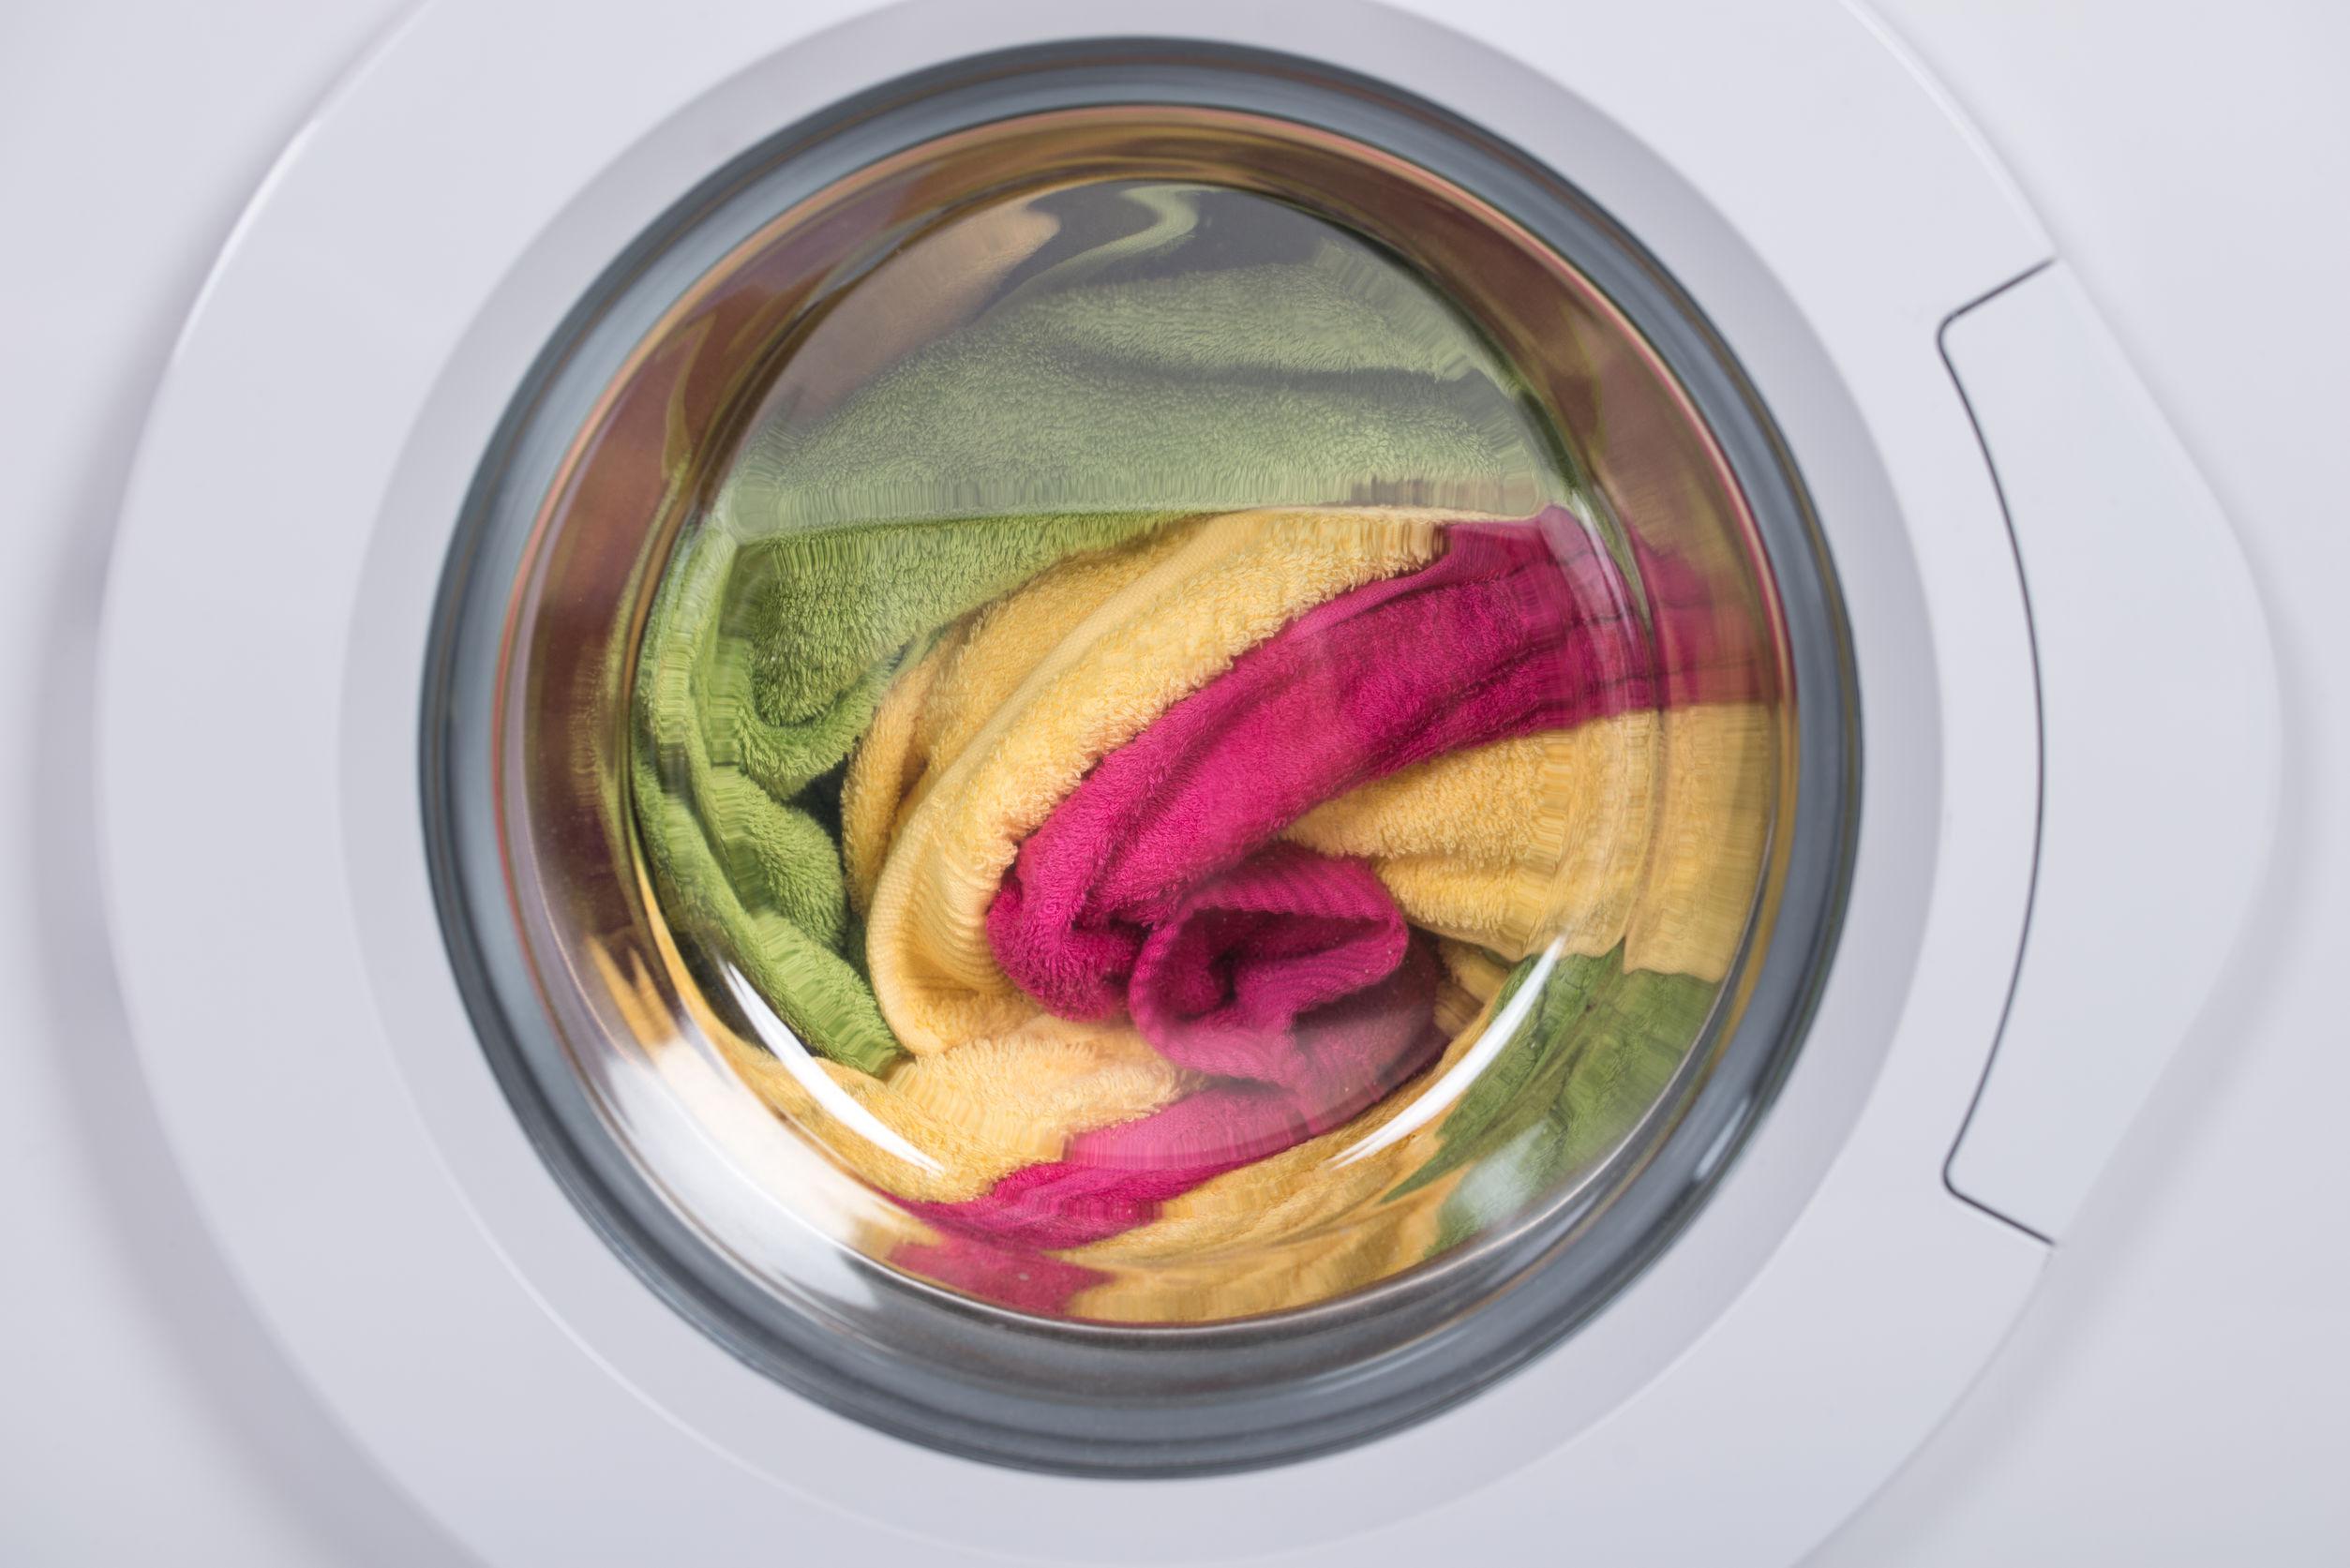 Roupas sendo lavada na máquina.